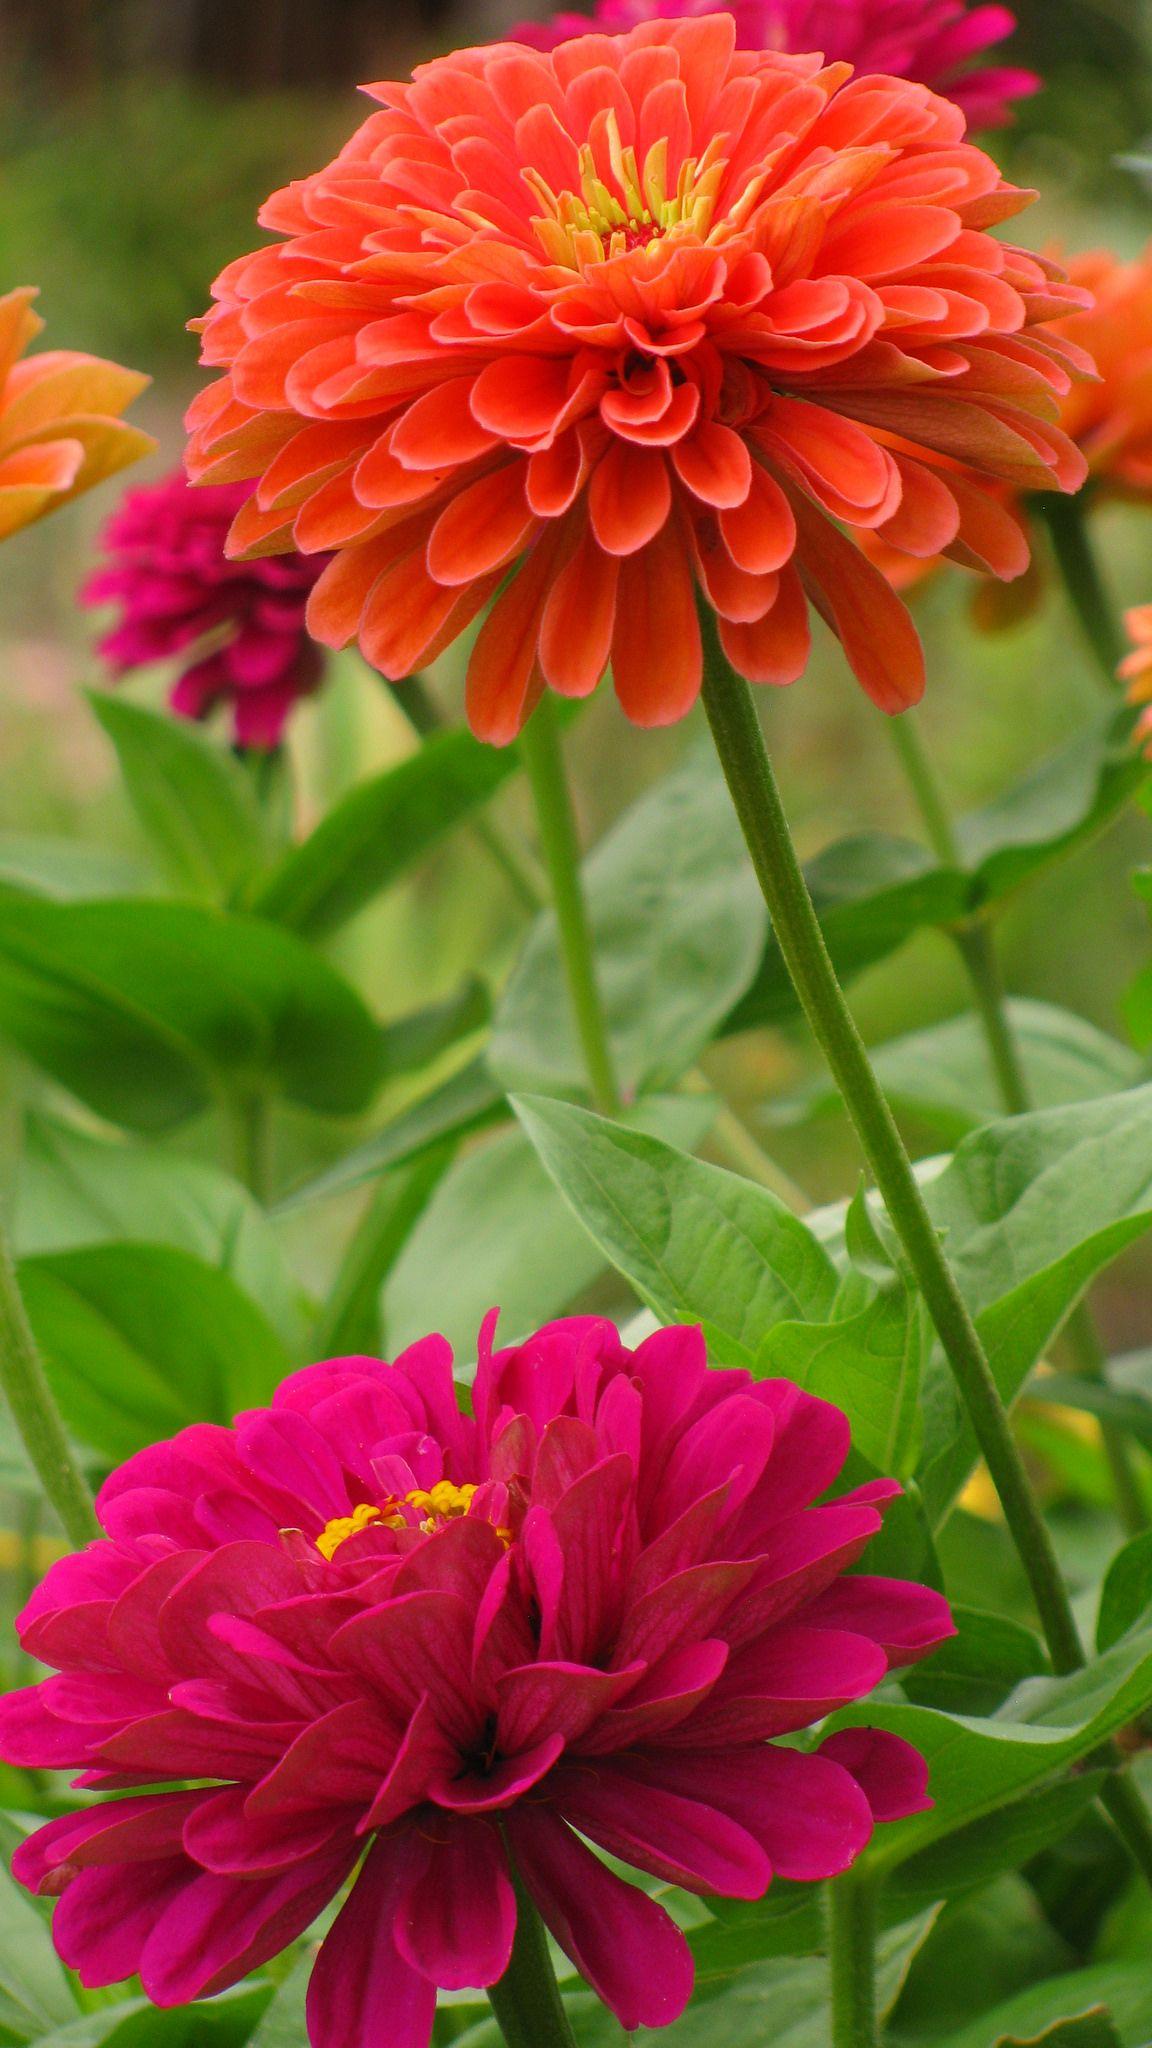 Pin By Dallas On Plant Pics Zinnia Flowers Amazing Flowers Zinnia Elegans